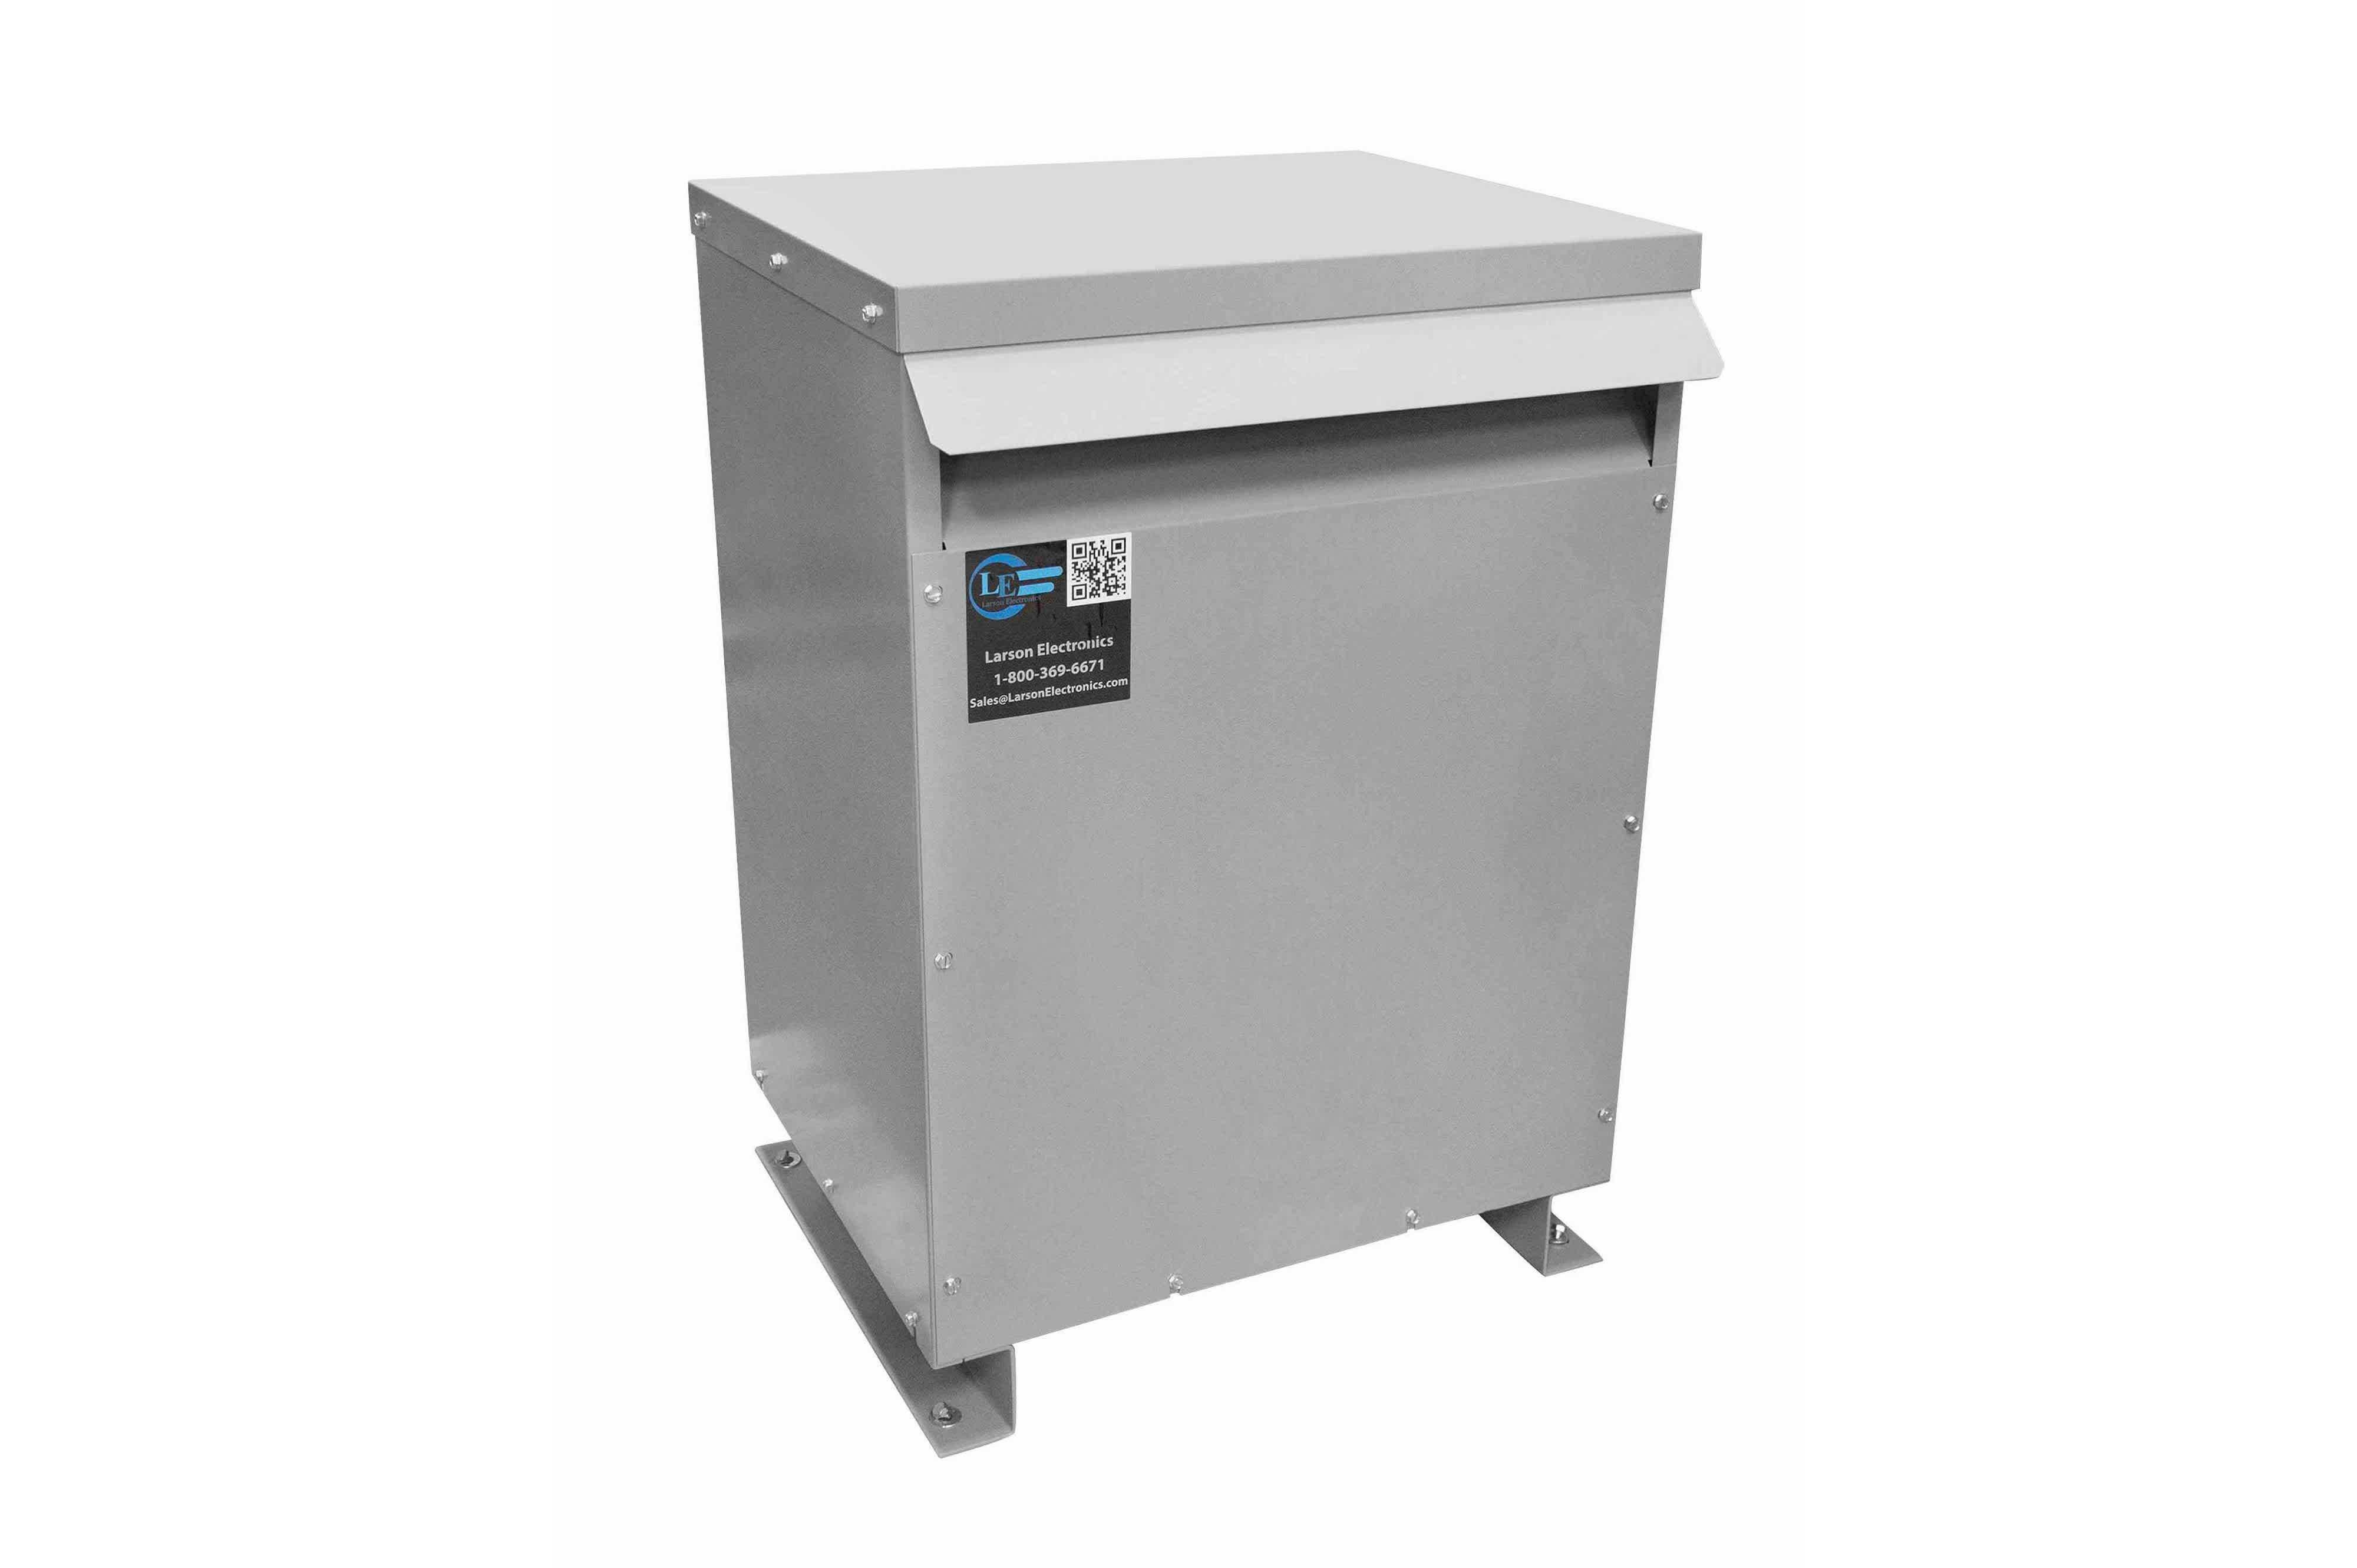 52.5 kVA 3PH Isolation Transformer, 460V Wye Primary, 415V Delta Secondary, N3R, Ventilated, 60 Hz